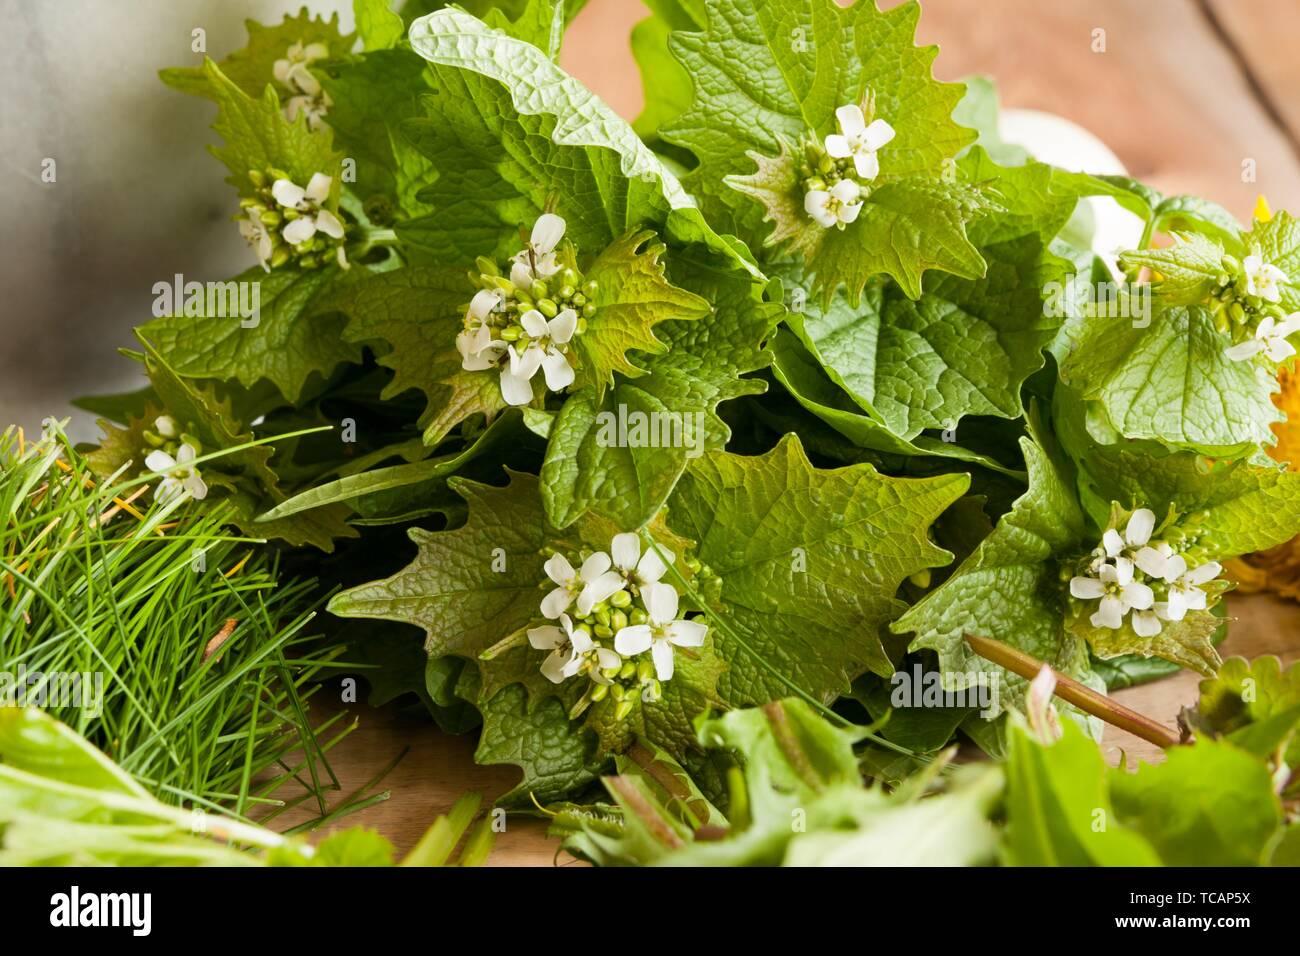 Alliaria petiolata ajo (mostaza) - plantas silvestres comestibles sobre un fondo de madera. Foto de stock